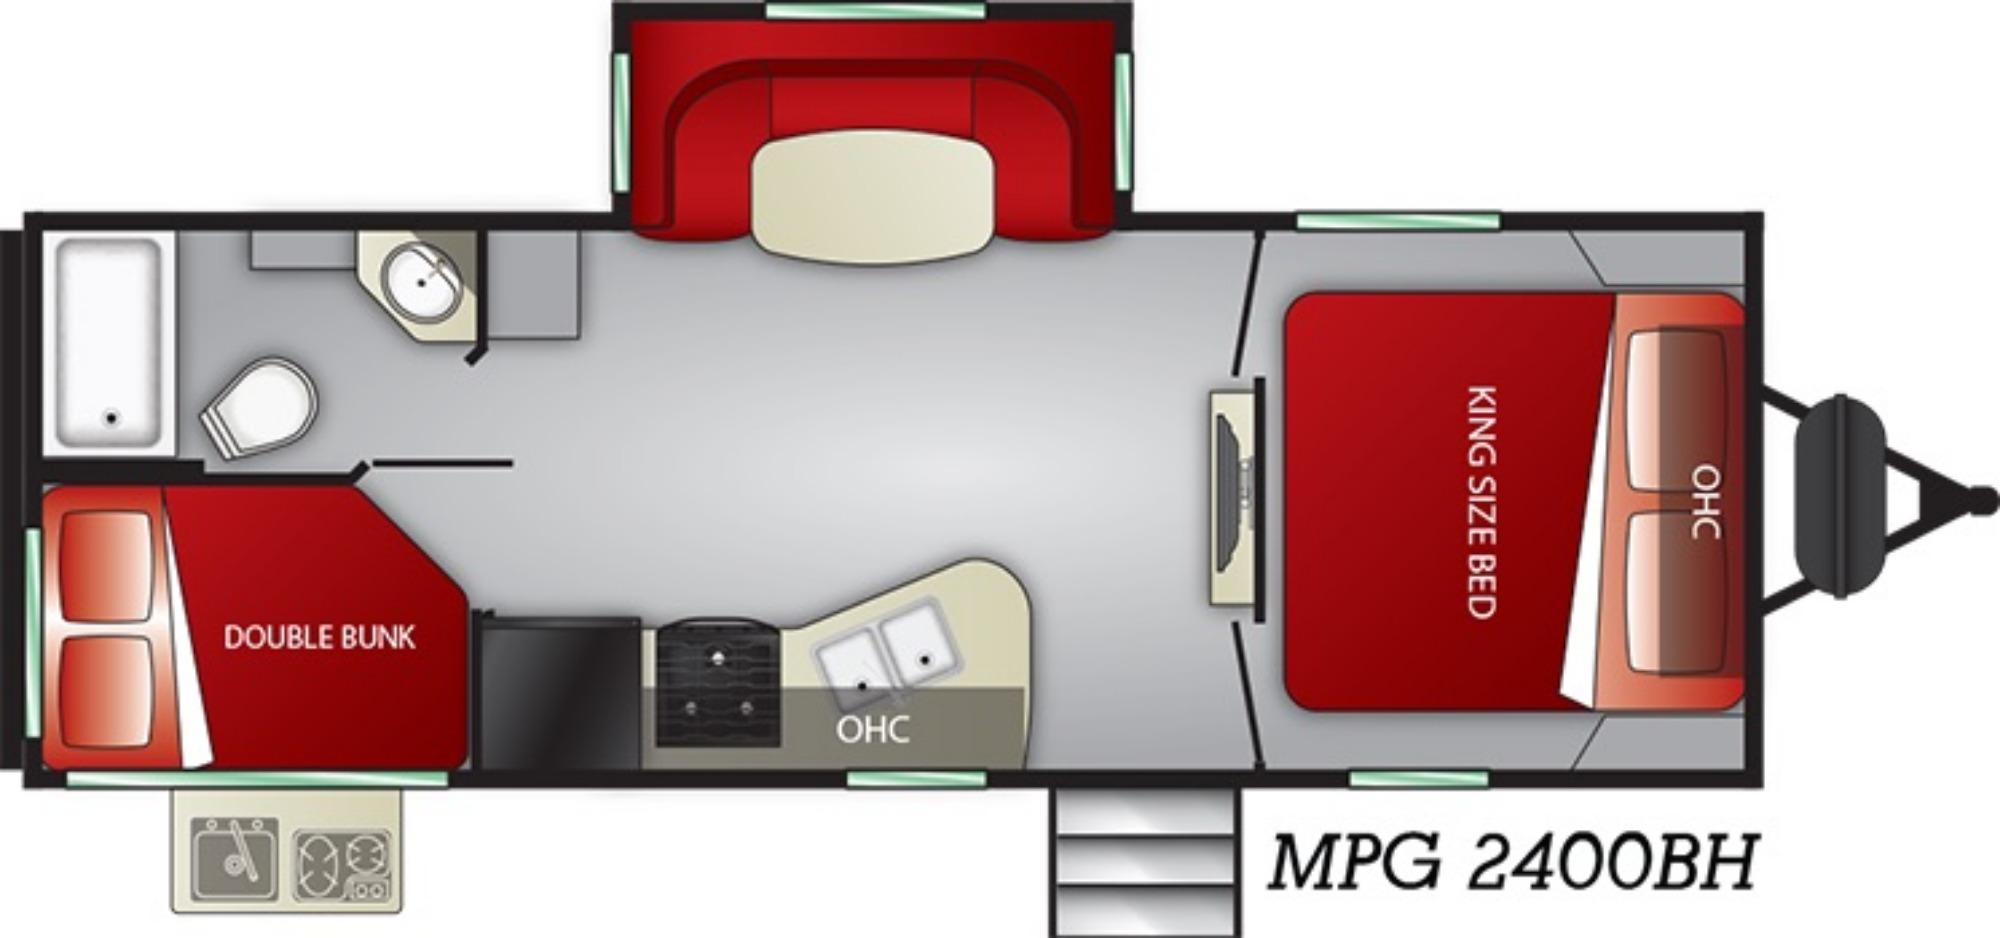 Exterior : 2019-CRUISER RV-2400BH